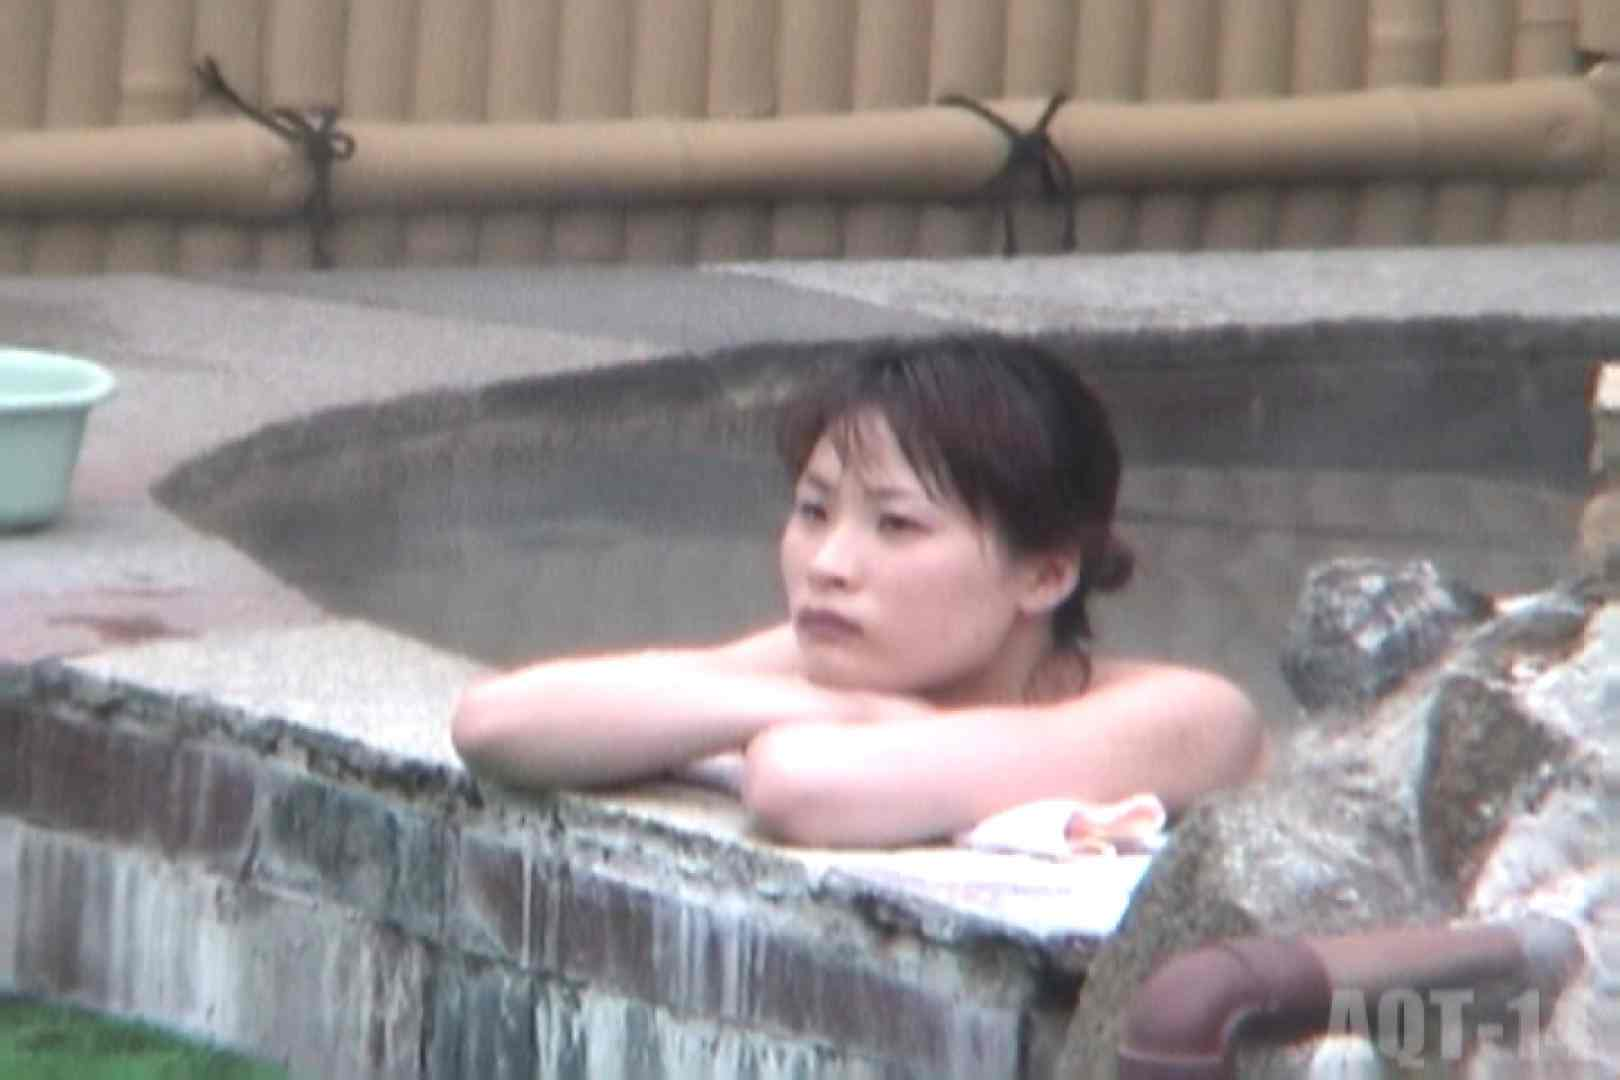 Aquaな露天風呂Vol.822 盗撮シリーズ | 露天風呂編  78PIX 3